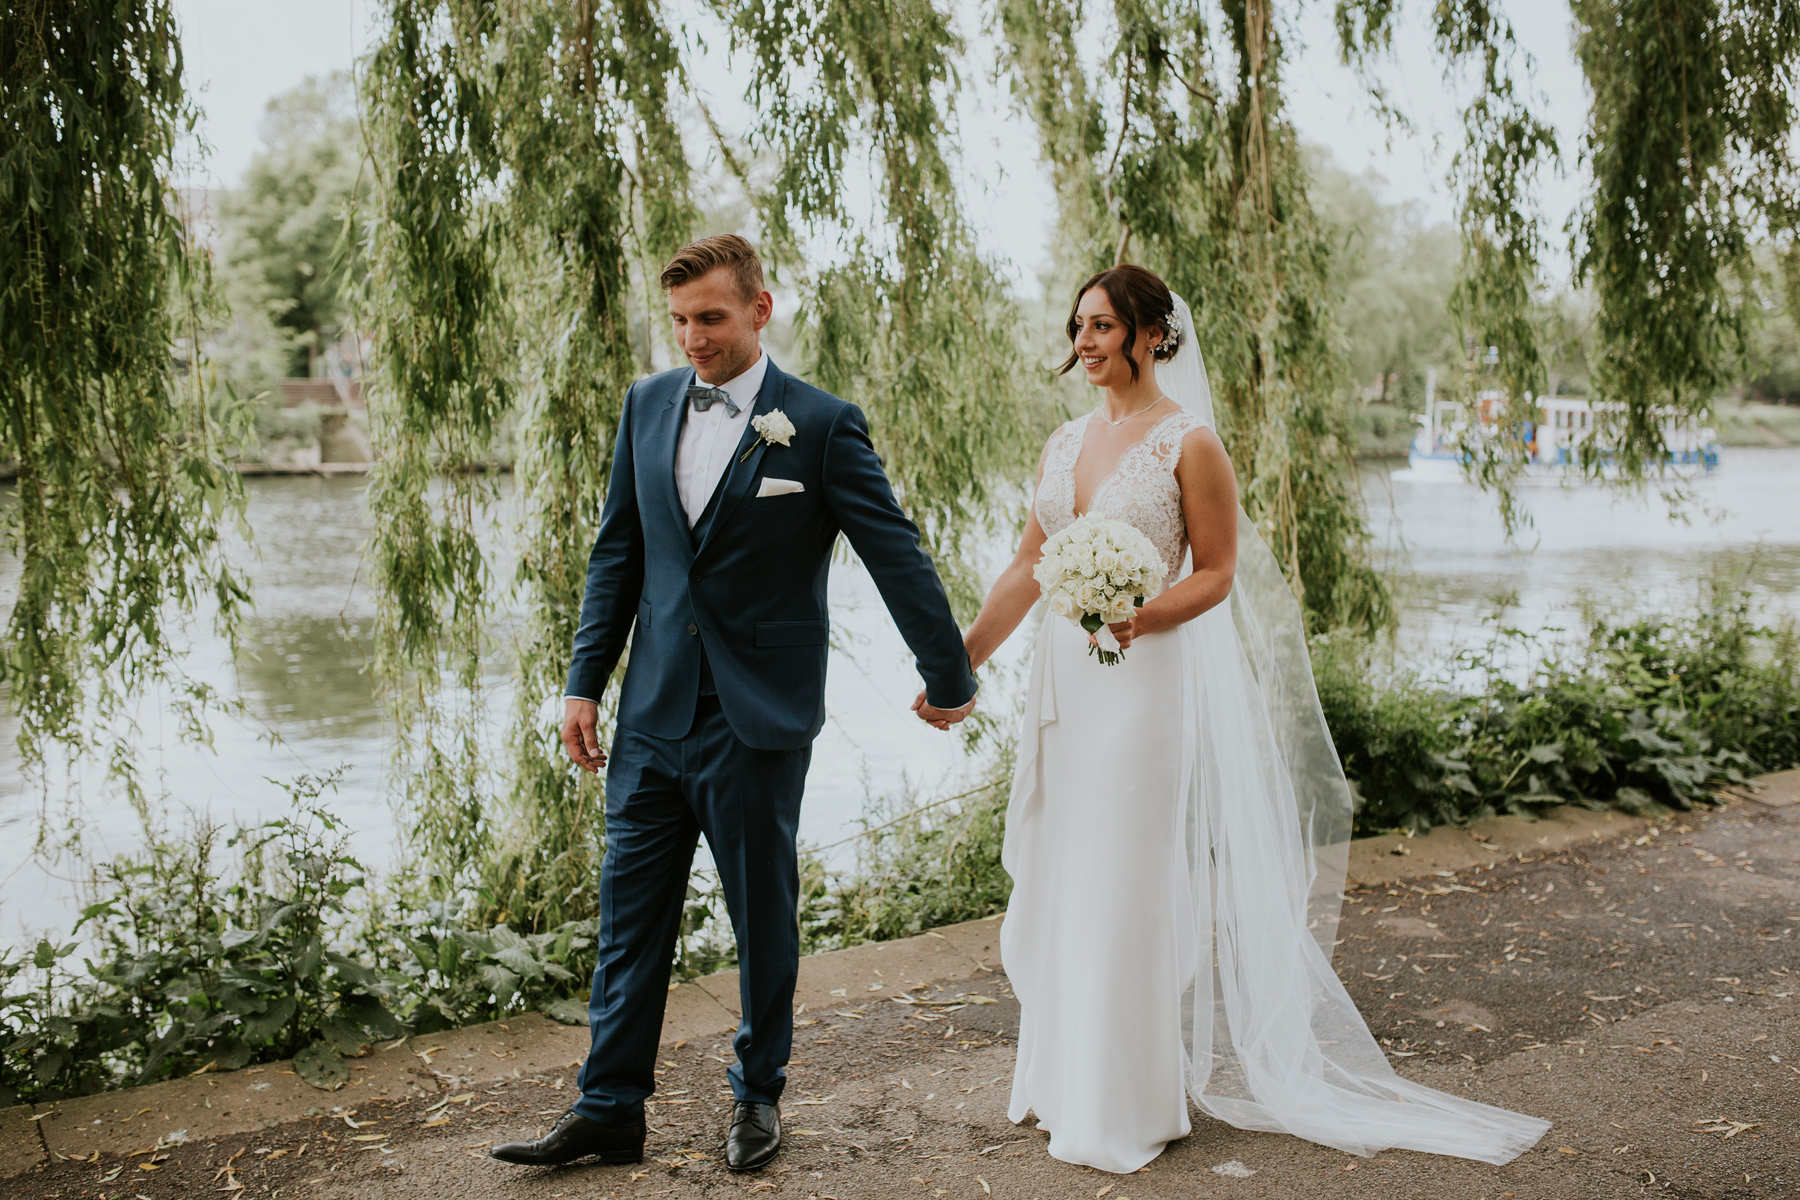 The Bingham wedding photographer couple walking on the tow path Suzanne Neville wedding dress